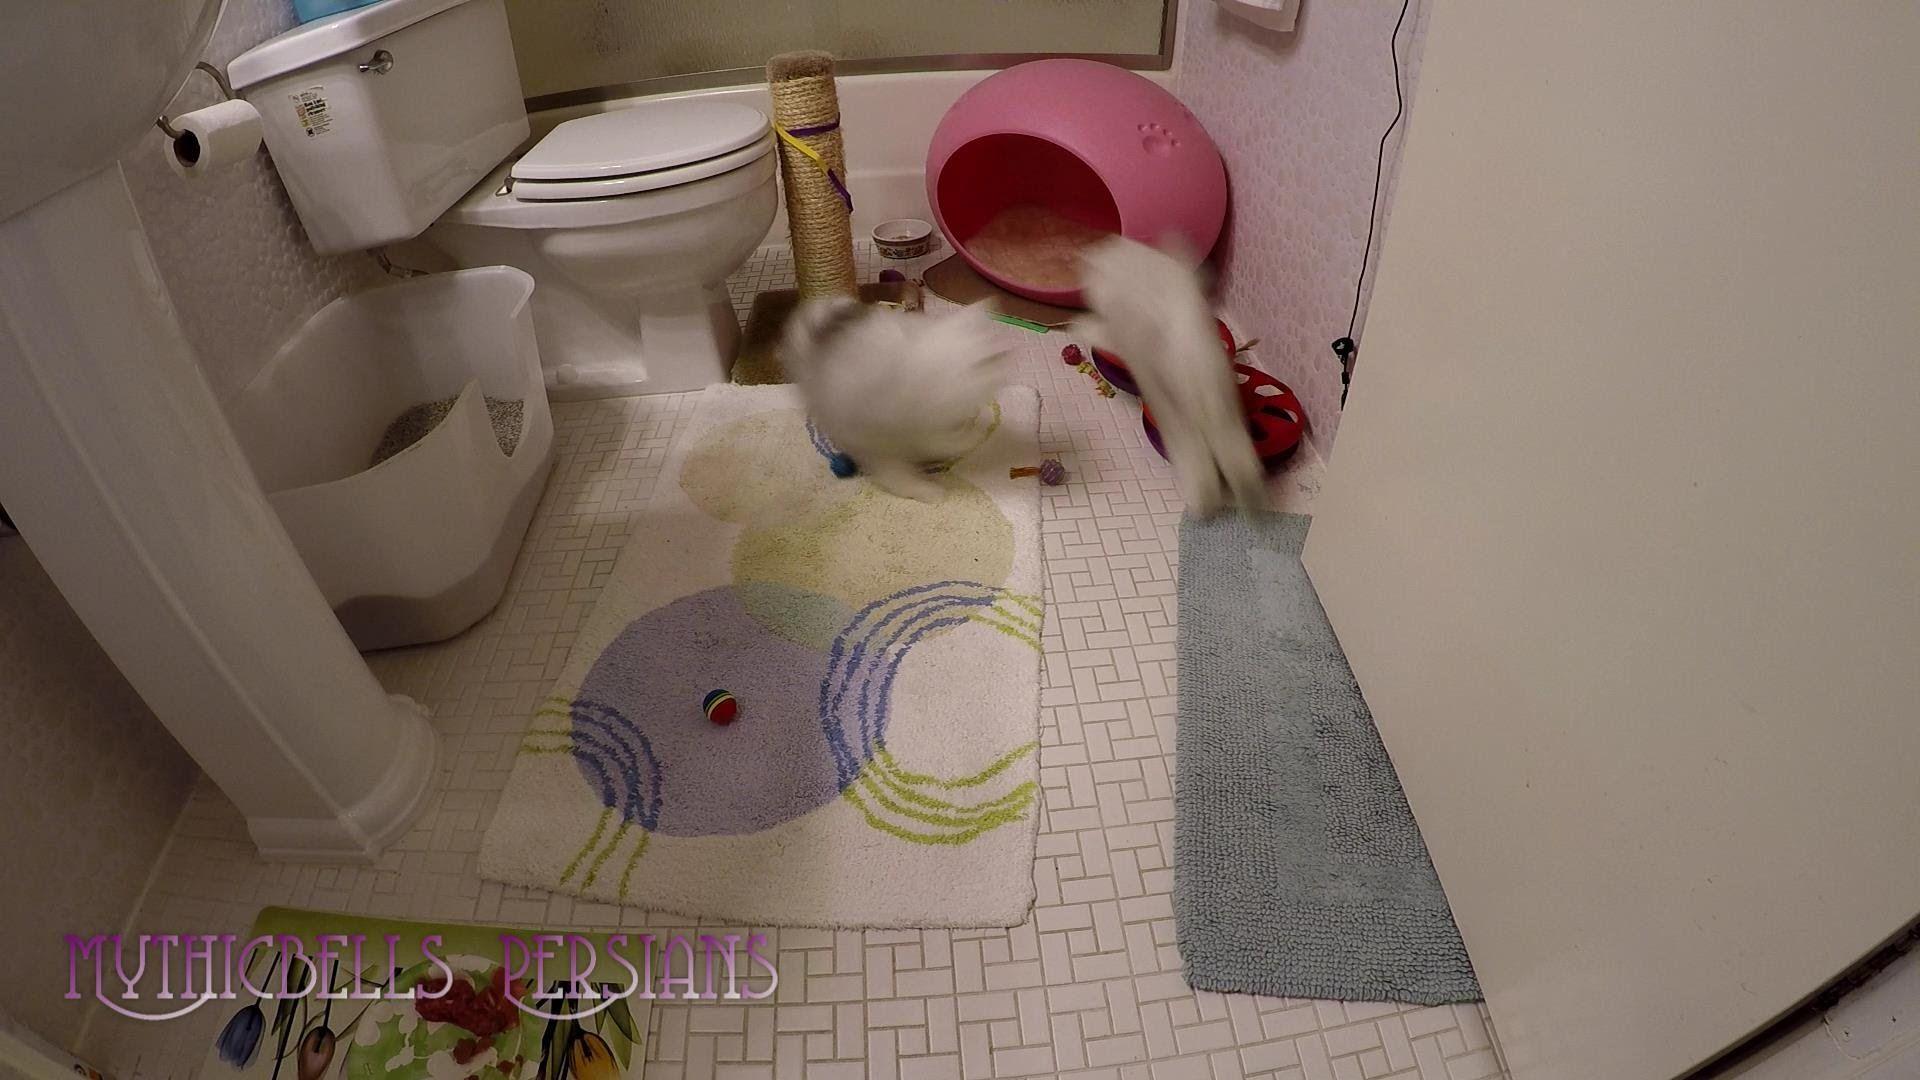 16 06 22 Persian Kittens Krakatoa And Sitka Morning Romp Persian Kittens Cute Kitten Gif Kittens